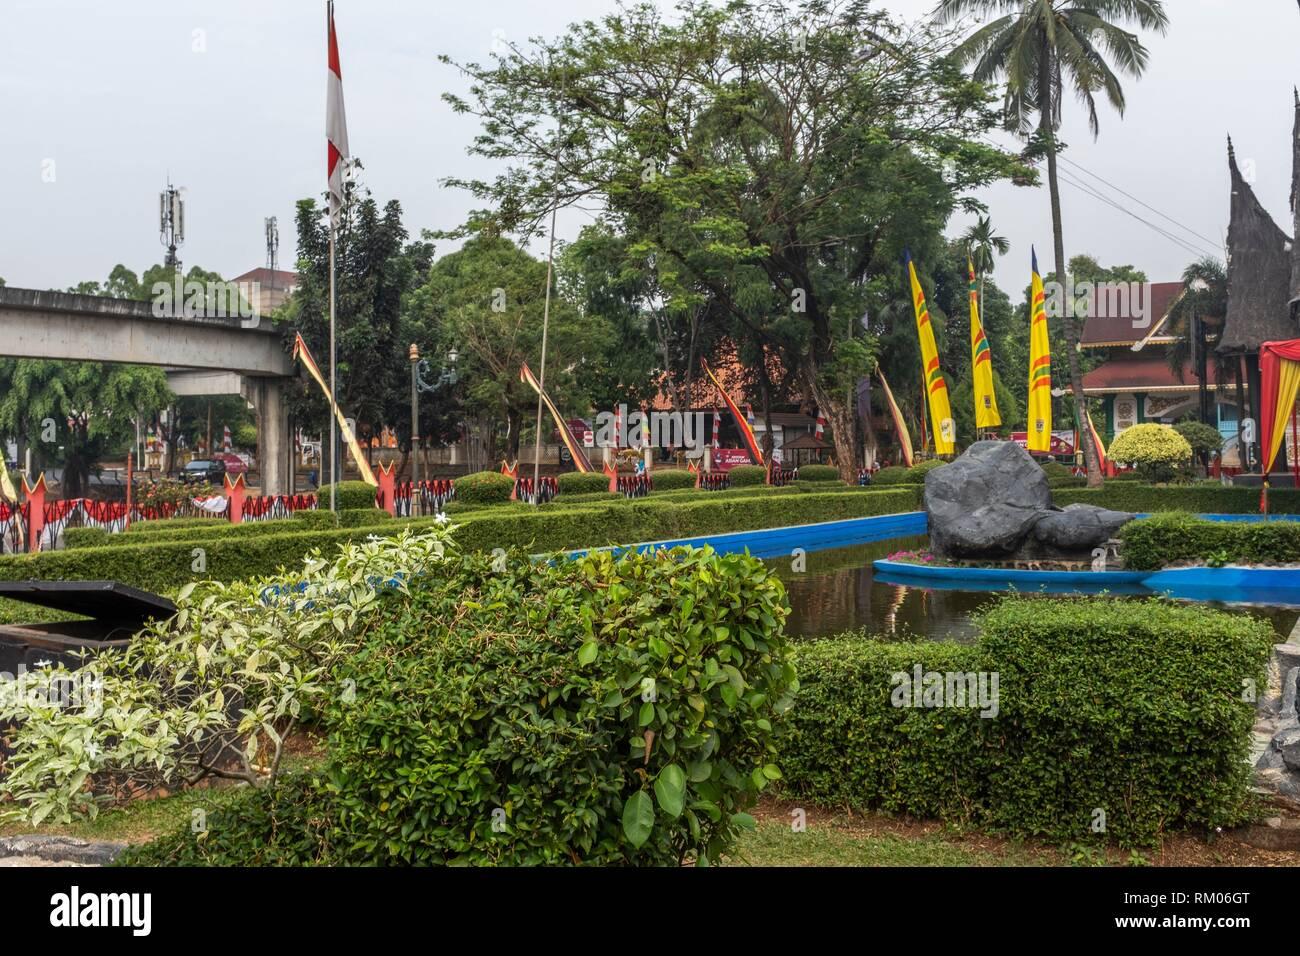 West Sumatra pavilion in Taman Mini Indonesia Indah Park, Jakarta - Stock Image